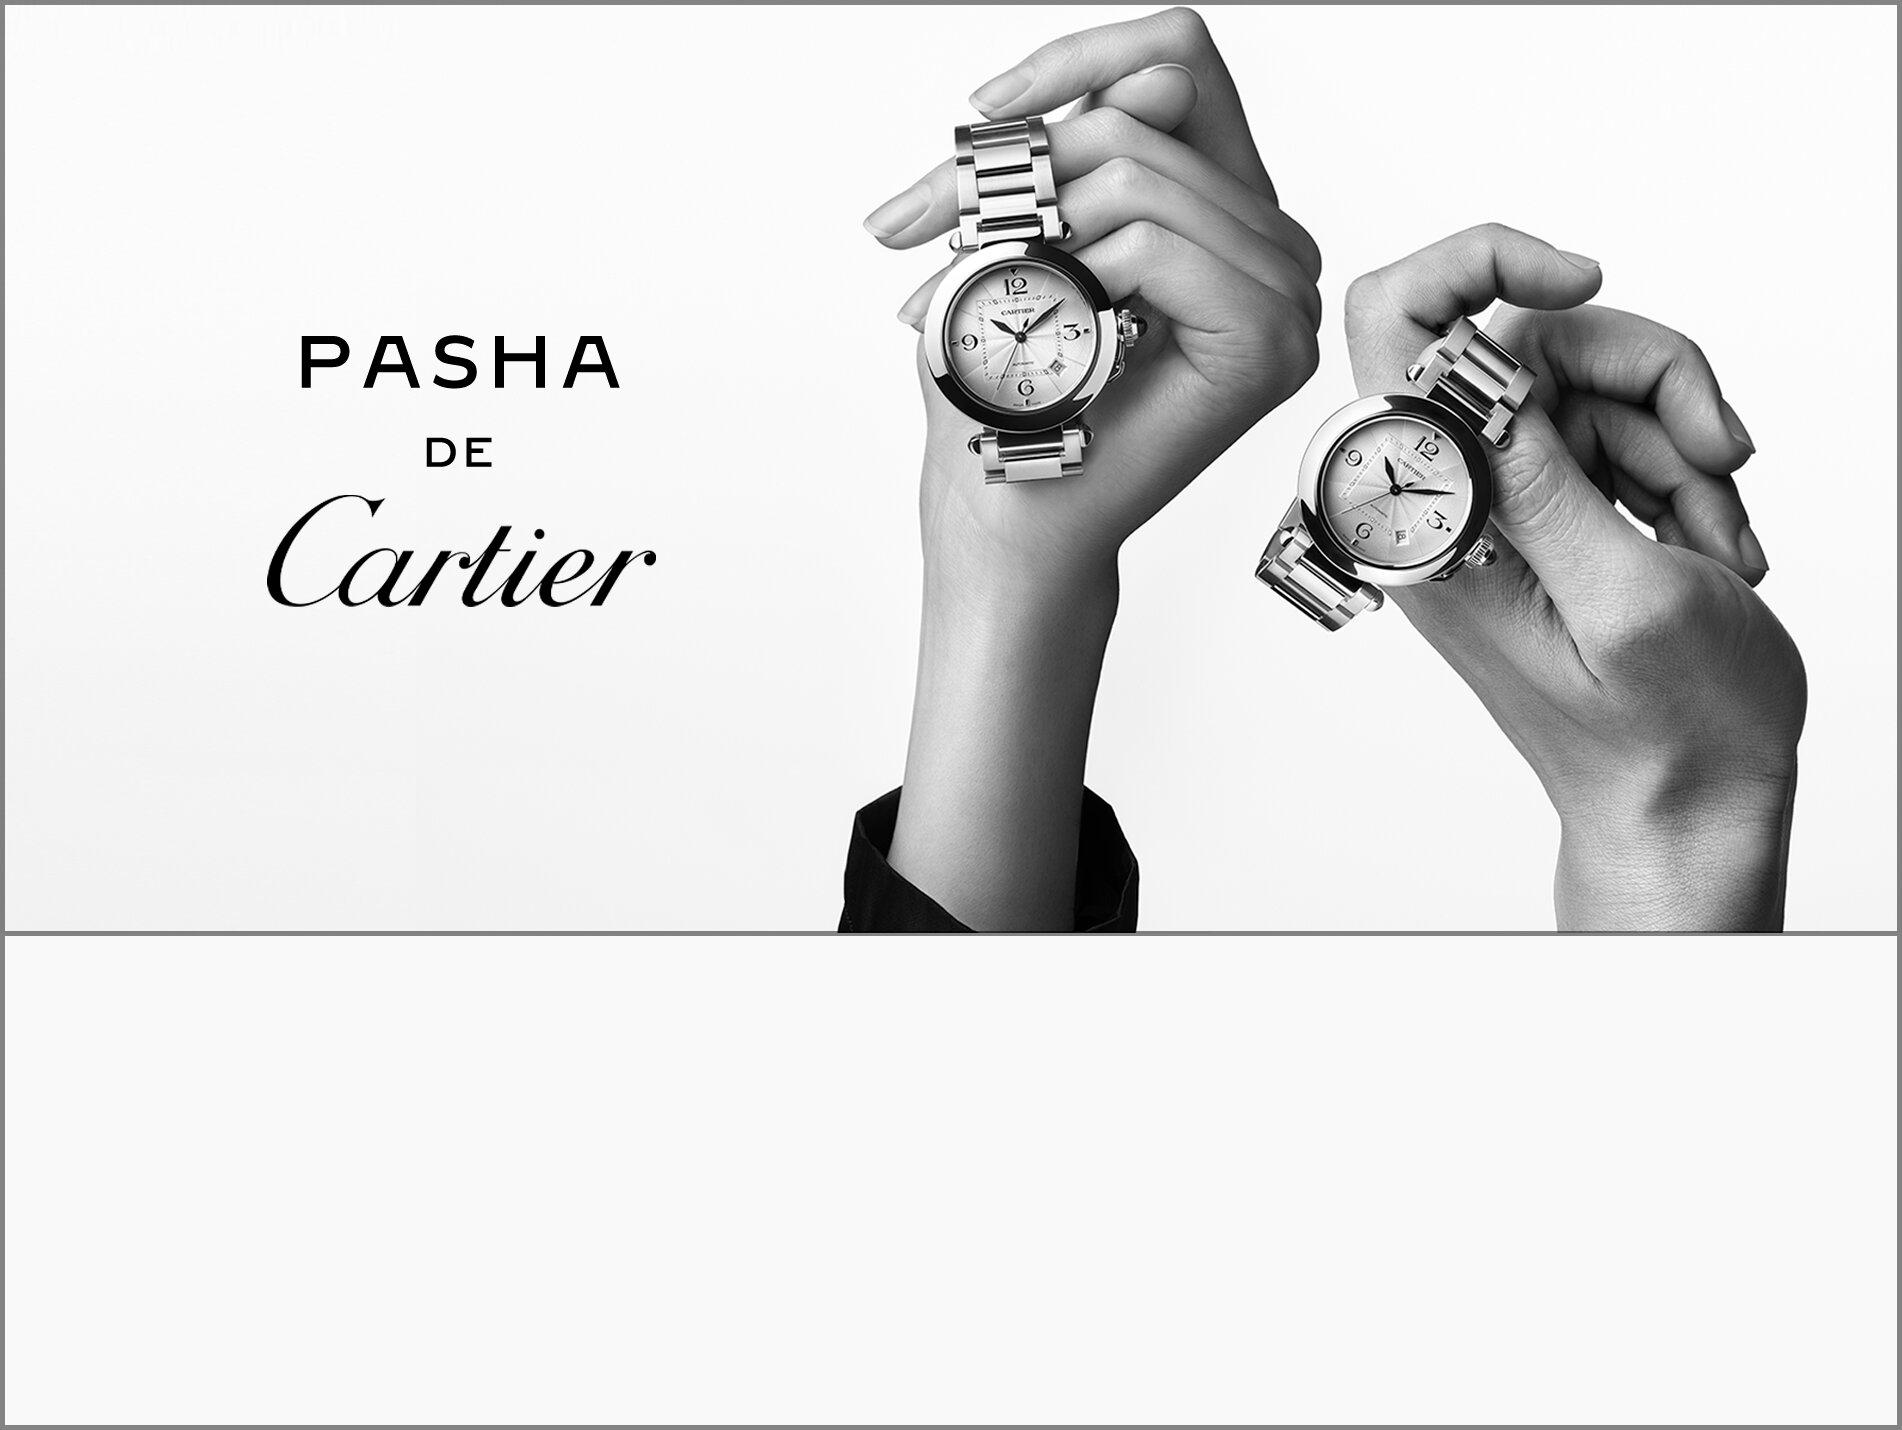 https://www.jarlsandin.se/pub_docs/files/Startsidaflight/Cartier-Pasha-se-kollektion-1920x1430px_v2.png